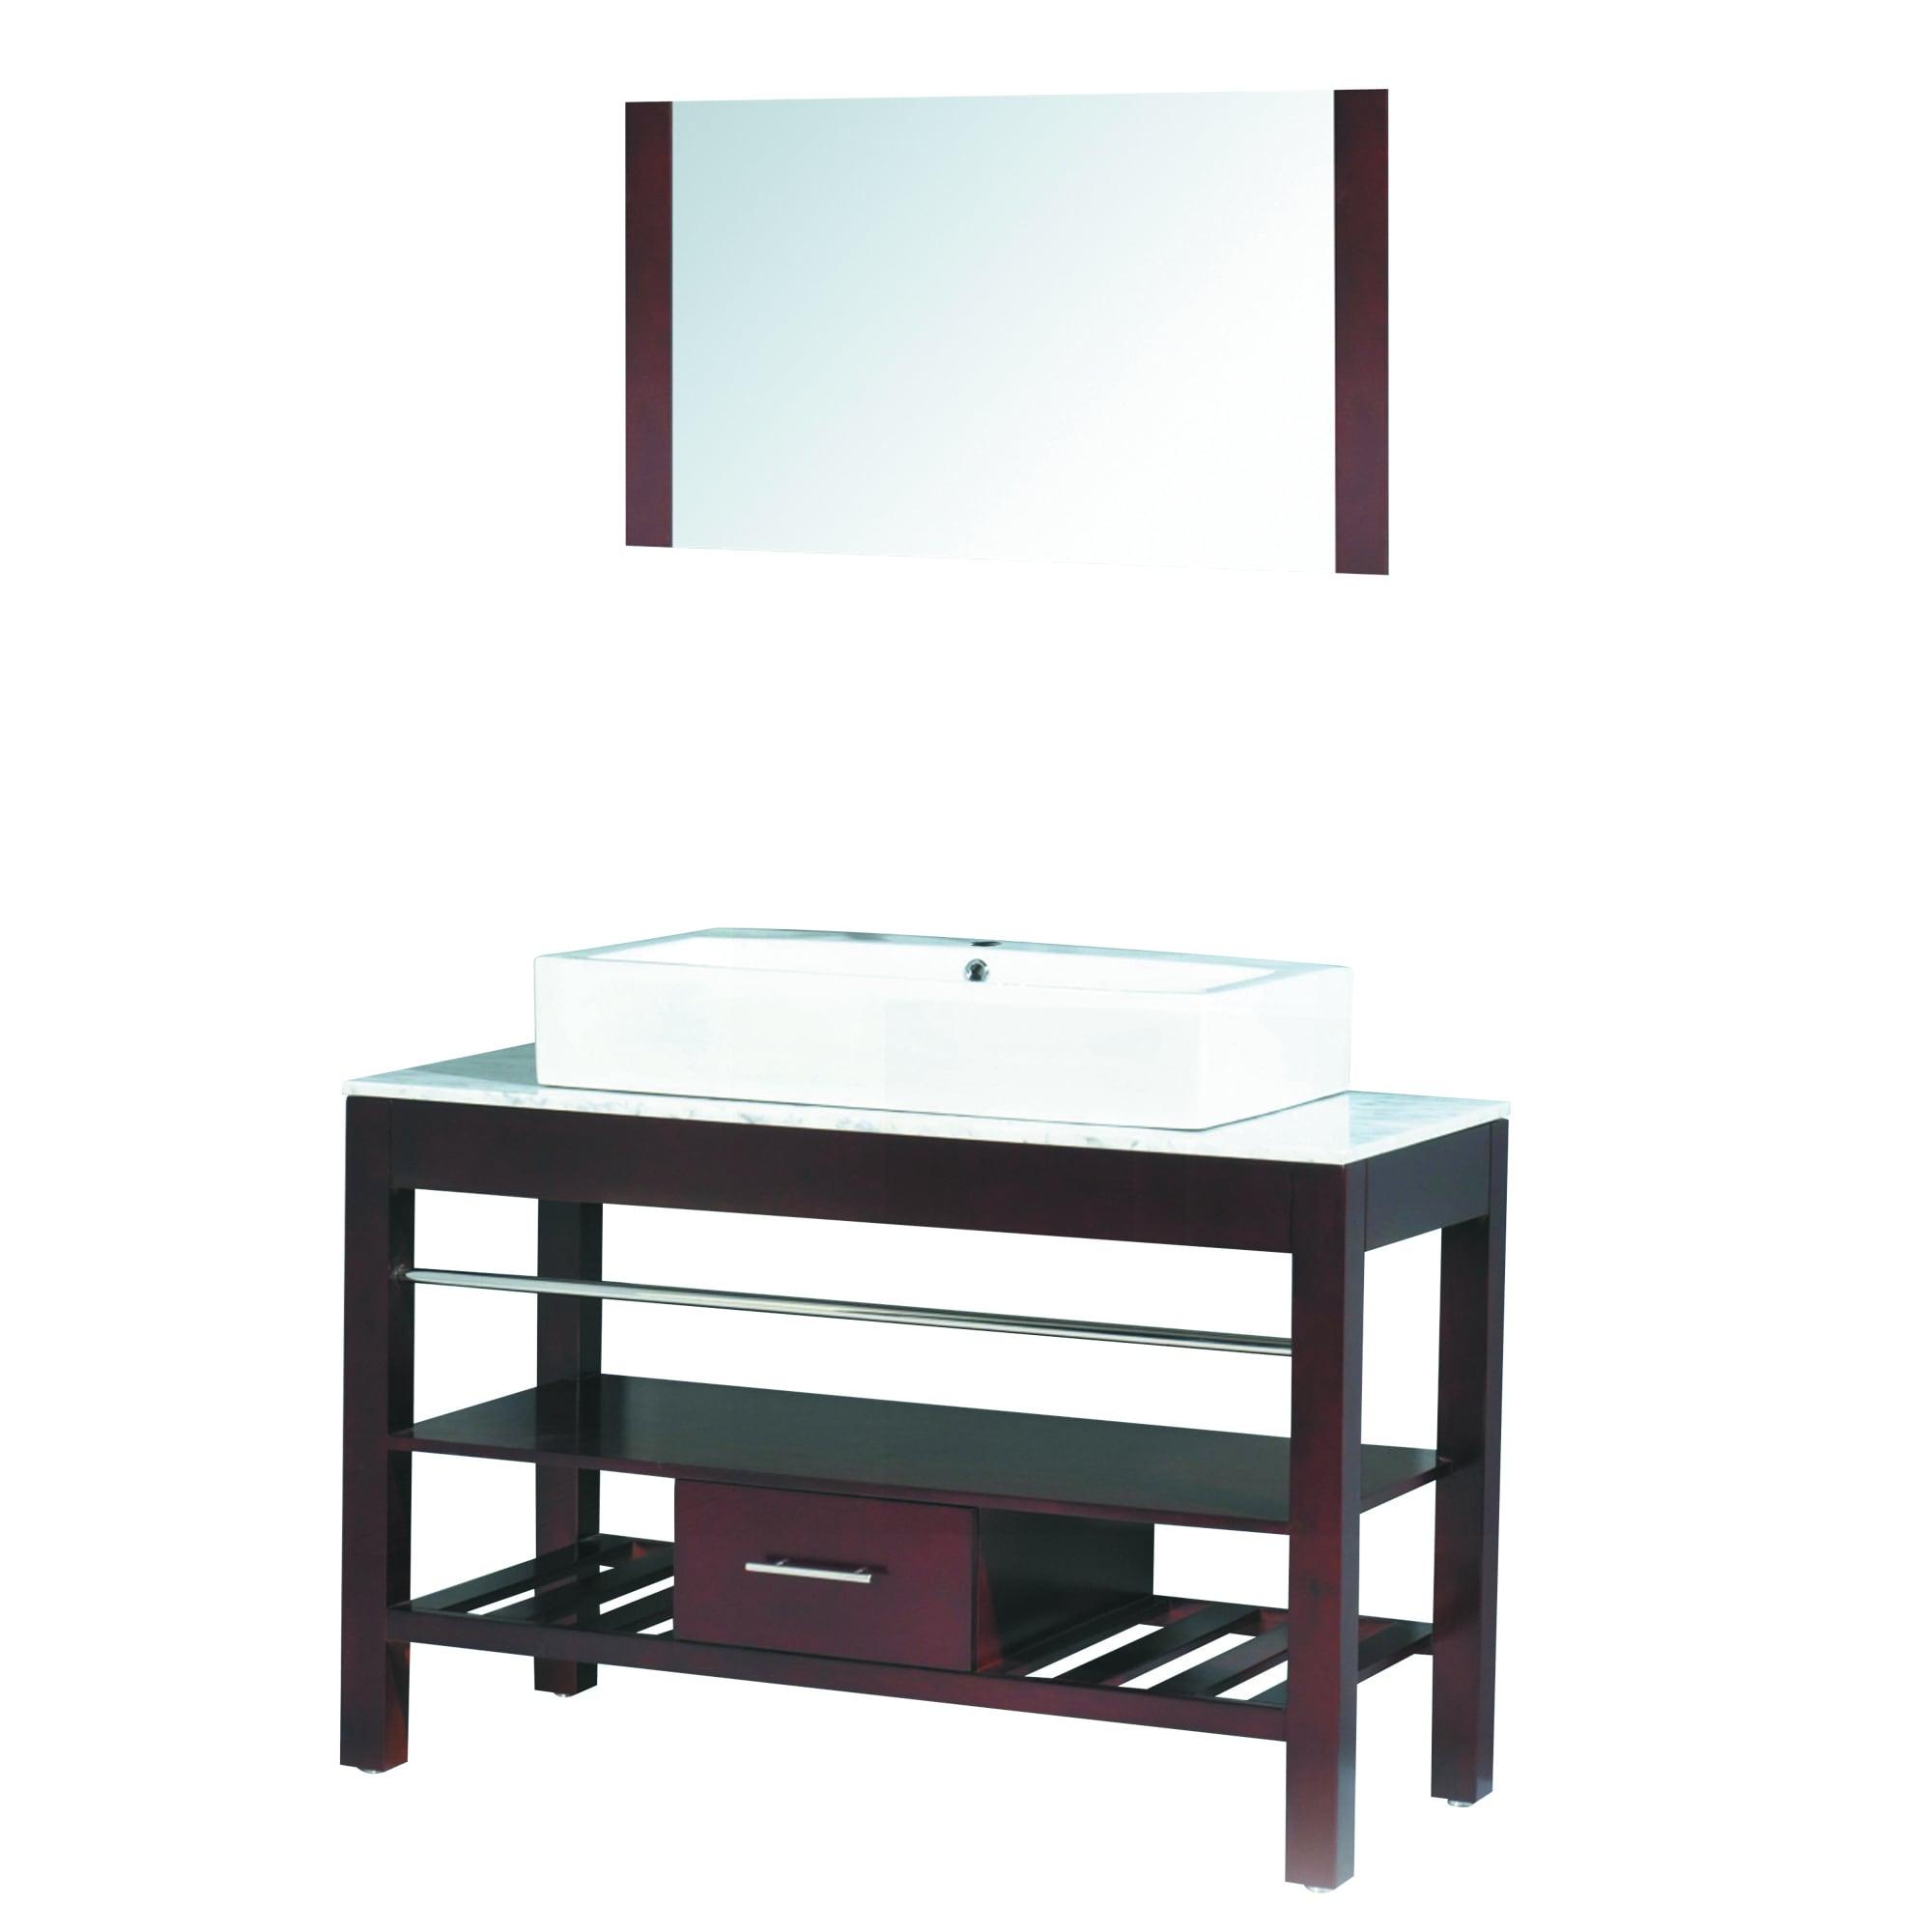 47 inch Wide Single Sink Bathroom Vanity in Espresso Overstock Shopping G